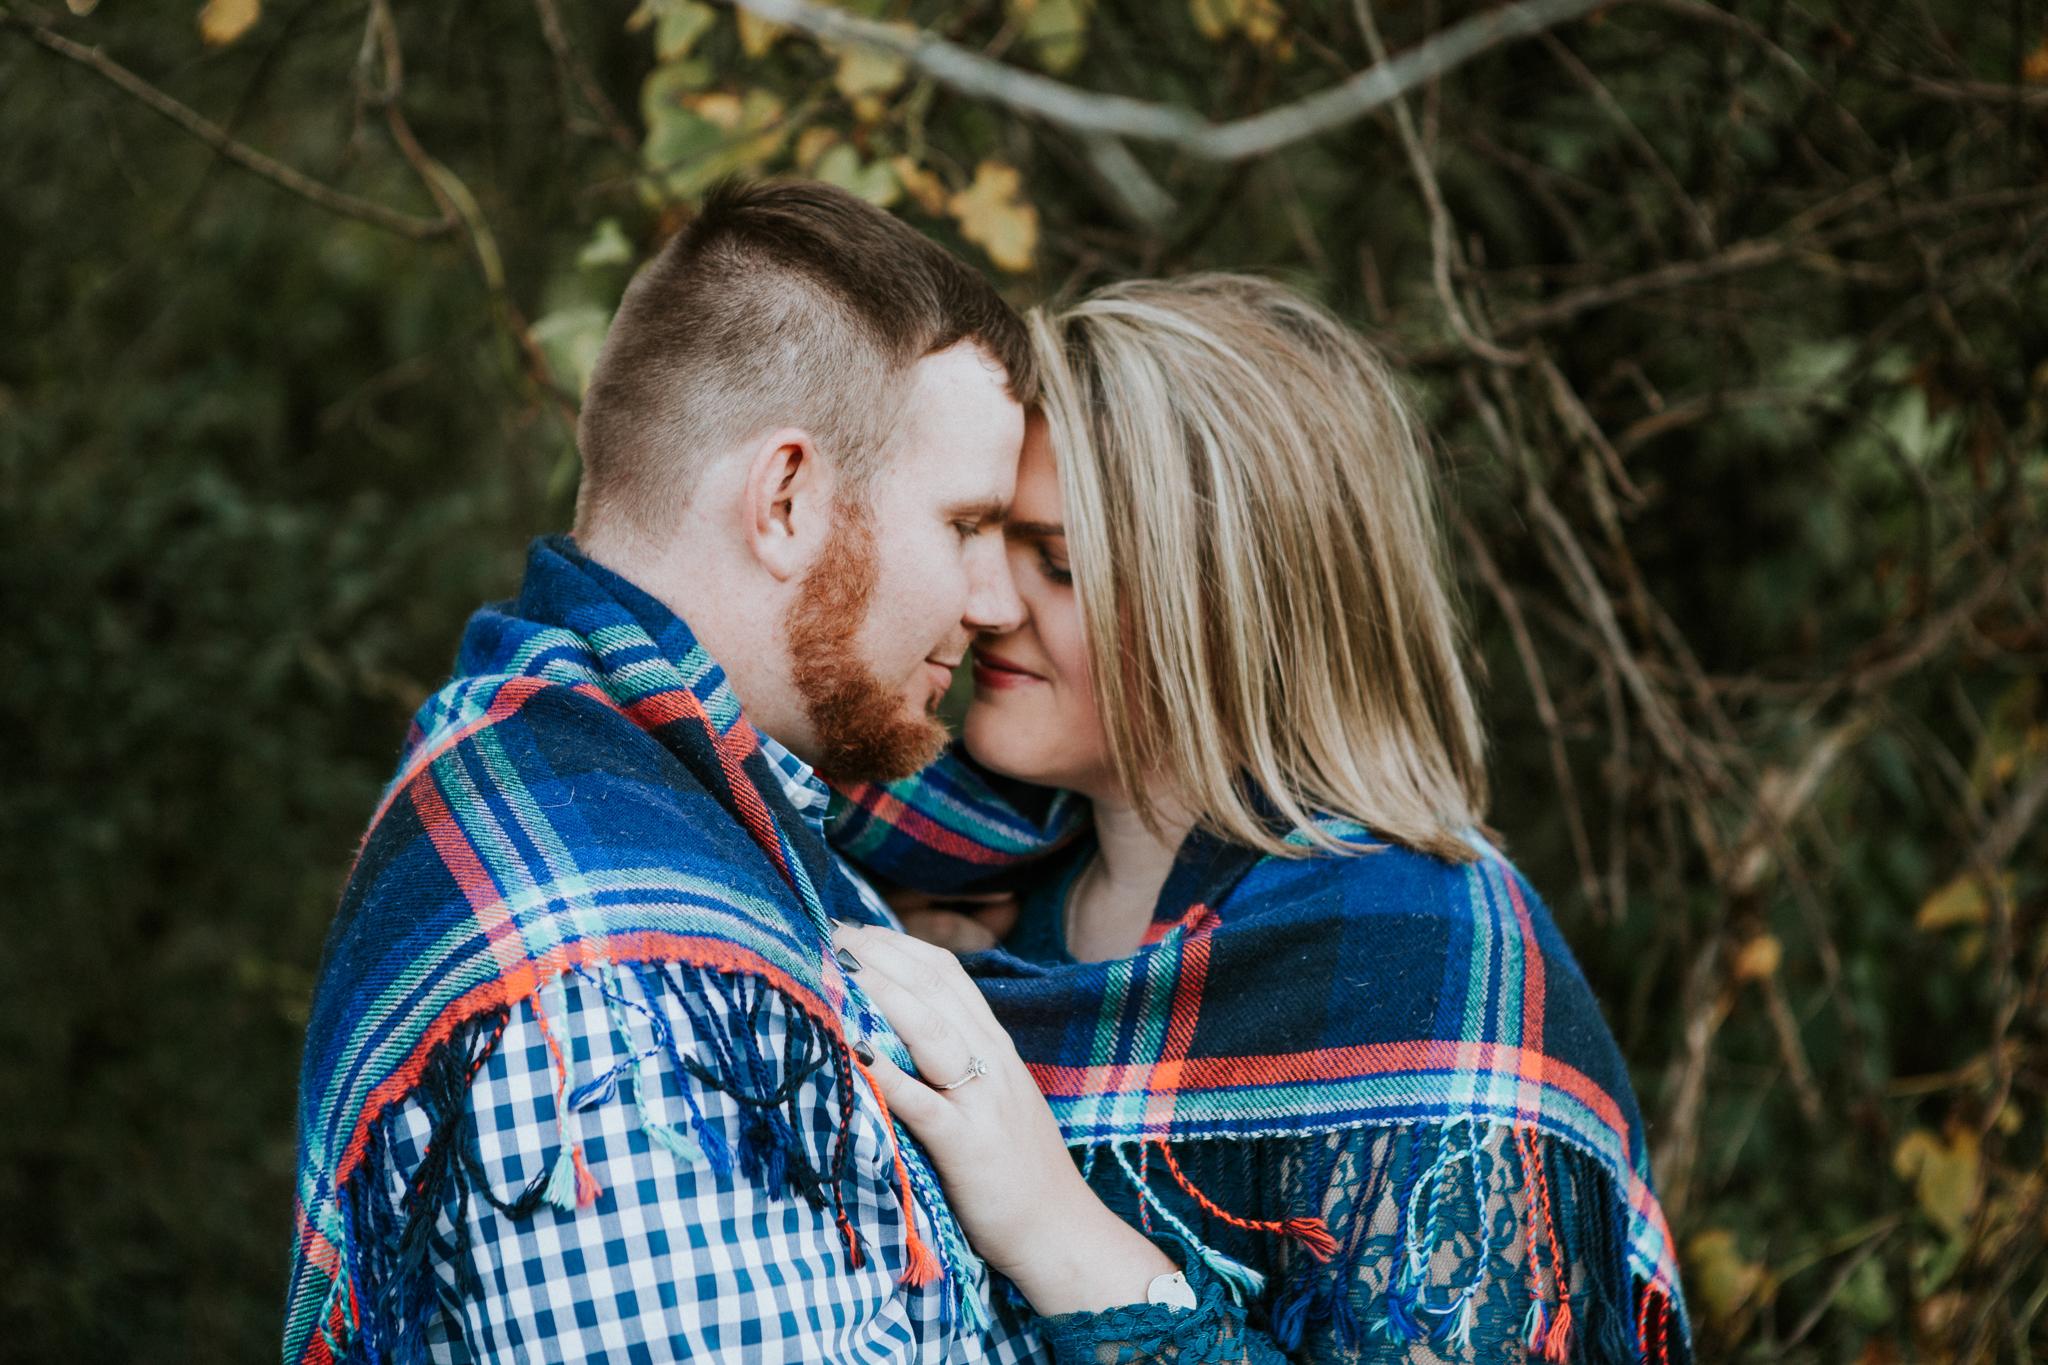 Richmond Kentucky Engagement Photographer - Ariana Jordan Photography -16.jpg